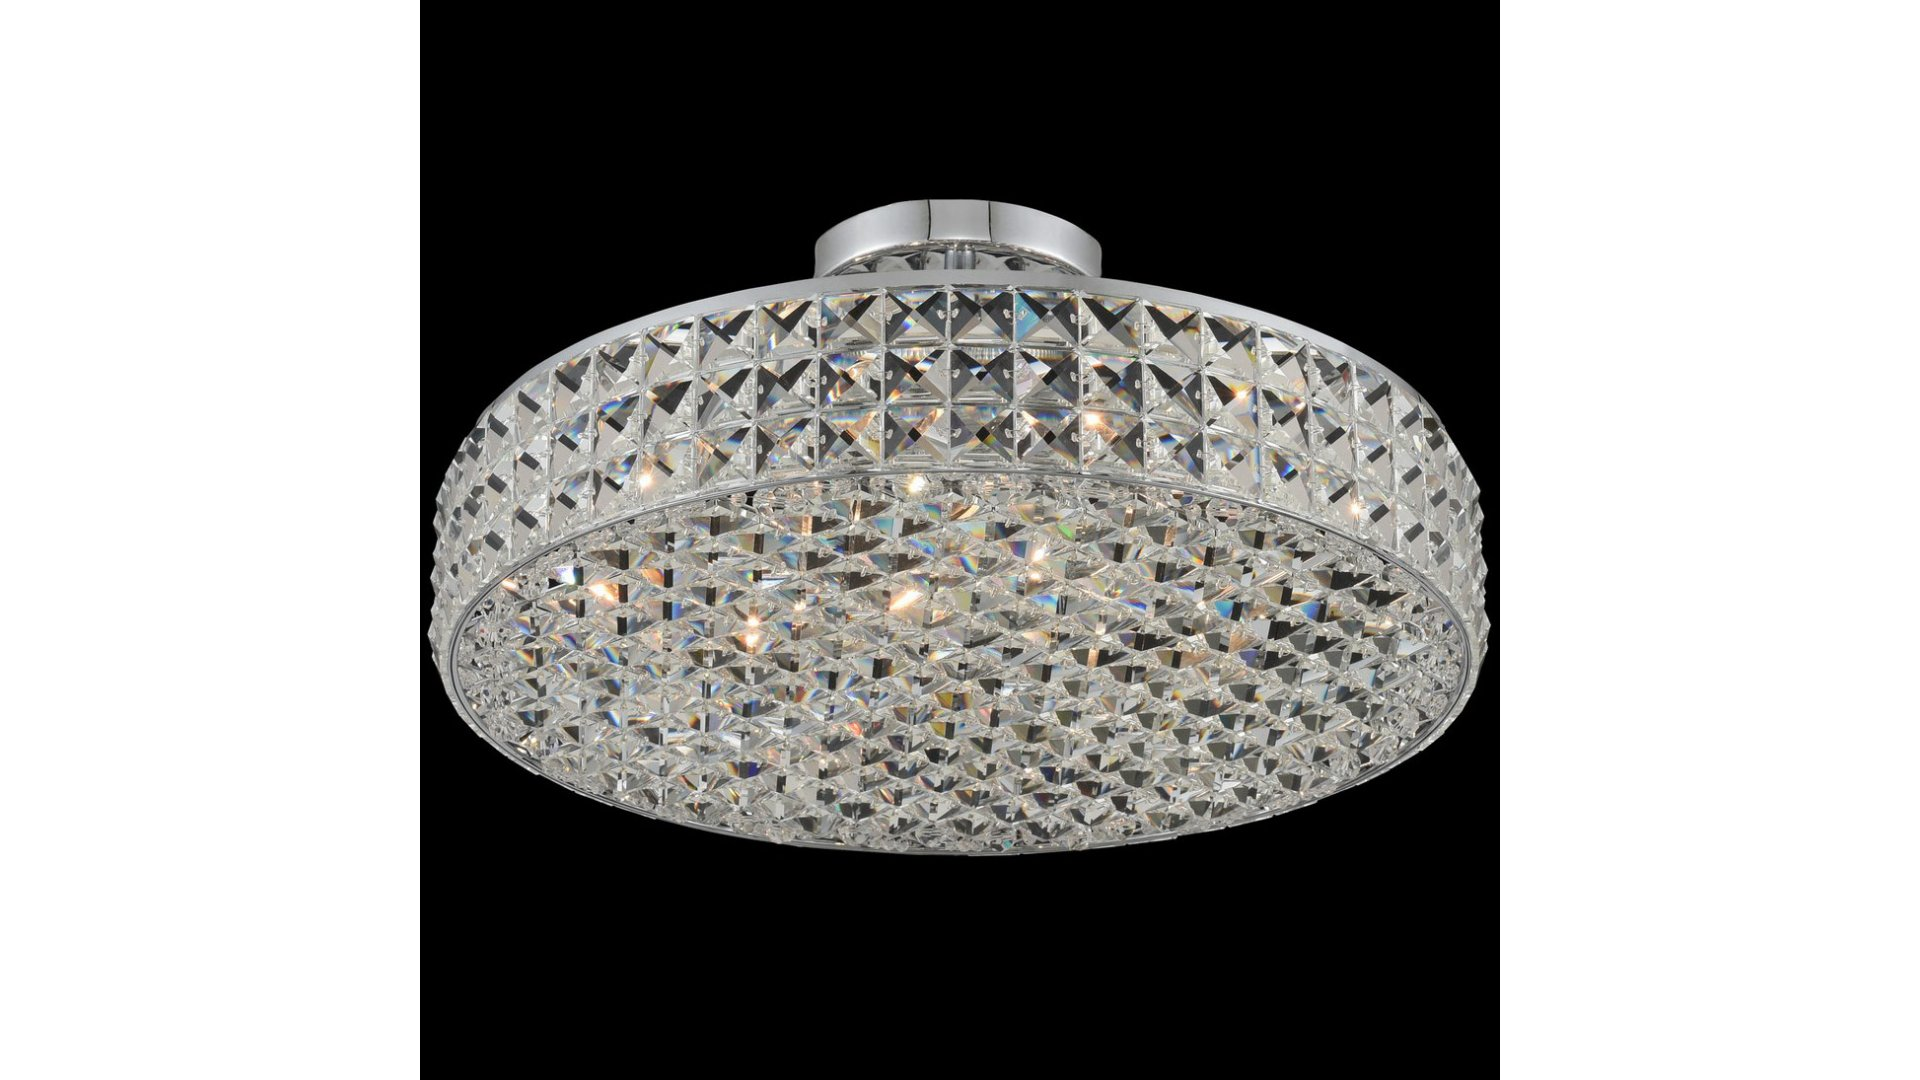 Allegri 032841fr001 Loro 16 Inch Semi Flush Mount Ceiling Light